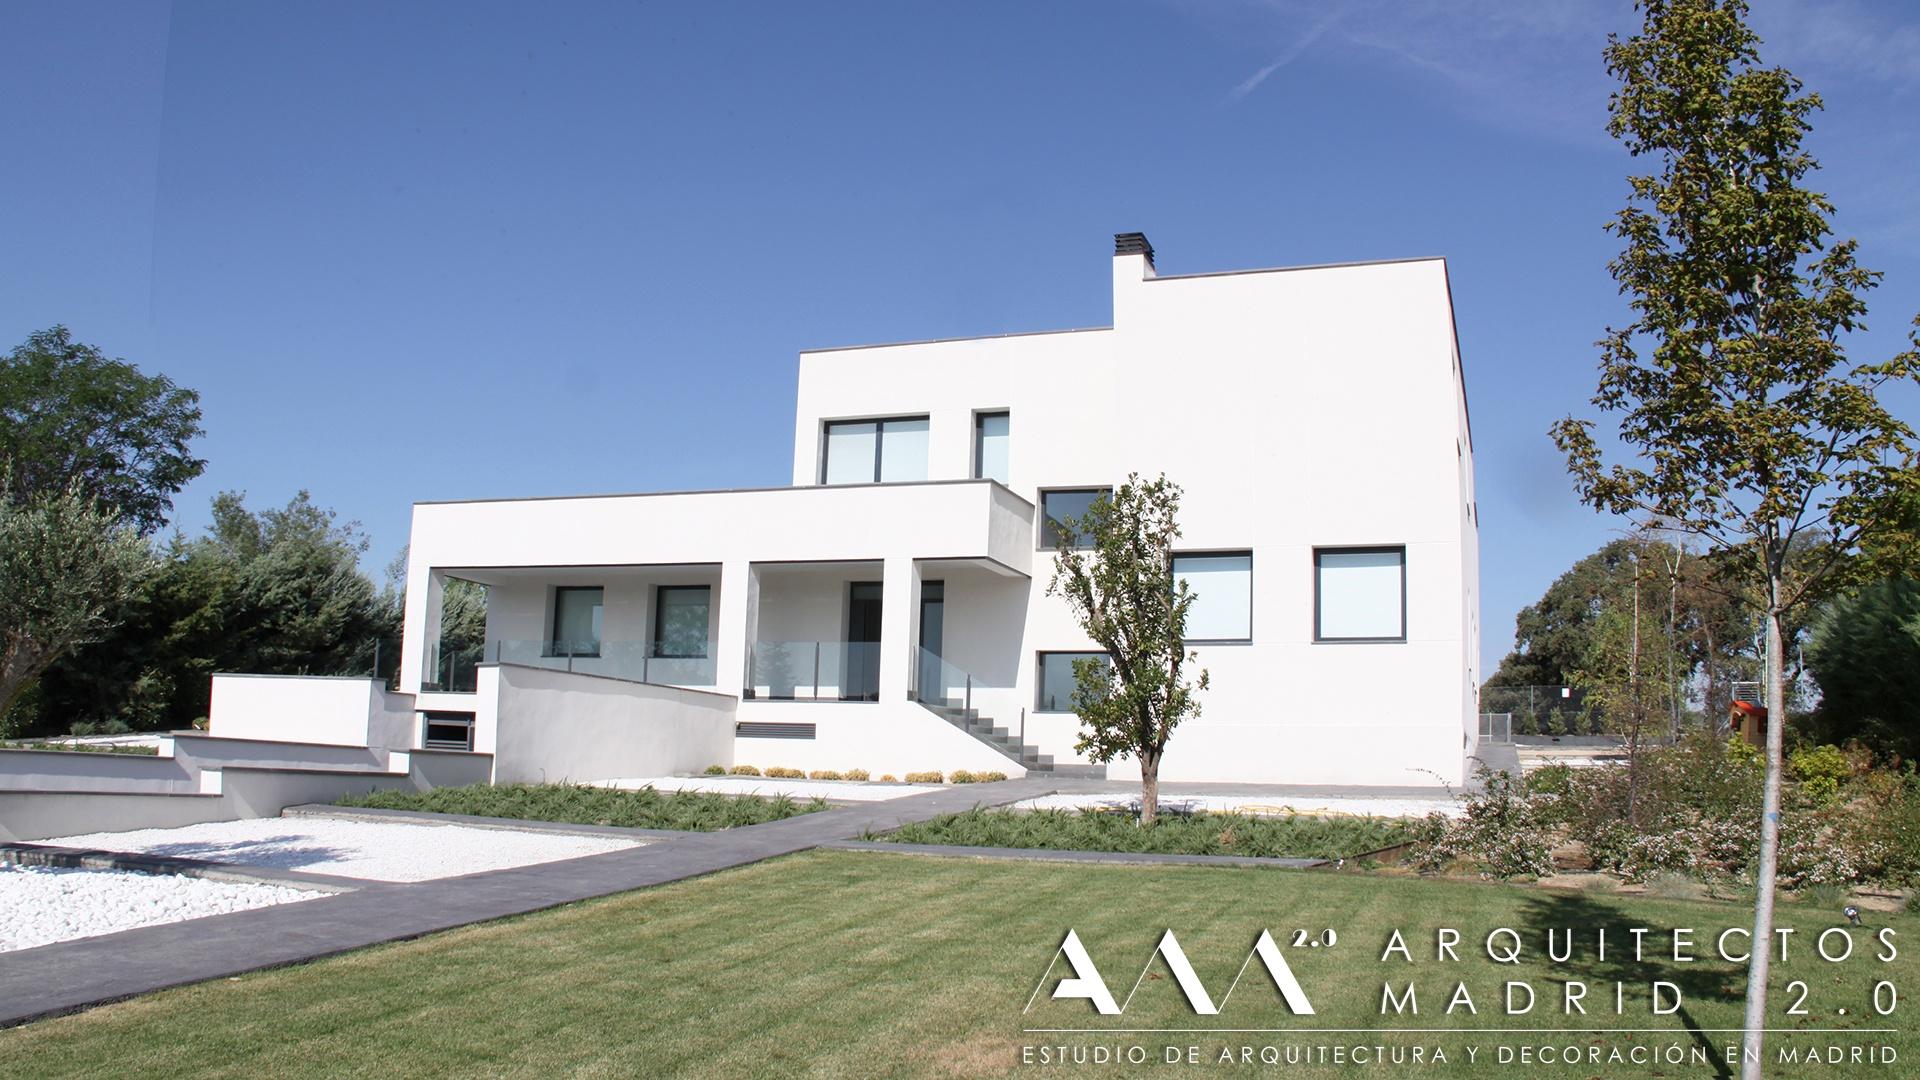 arquitectos-madrid-estudio-arquitectura-en-madrid-proyectos-casas-modernas-16